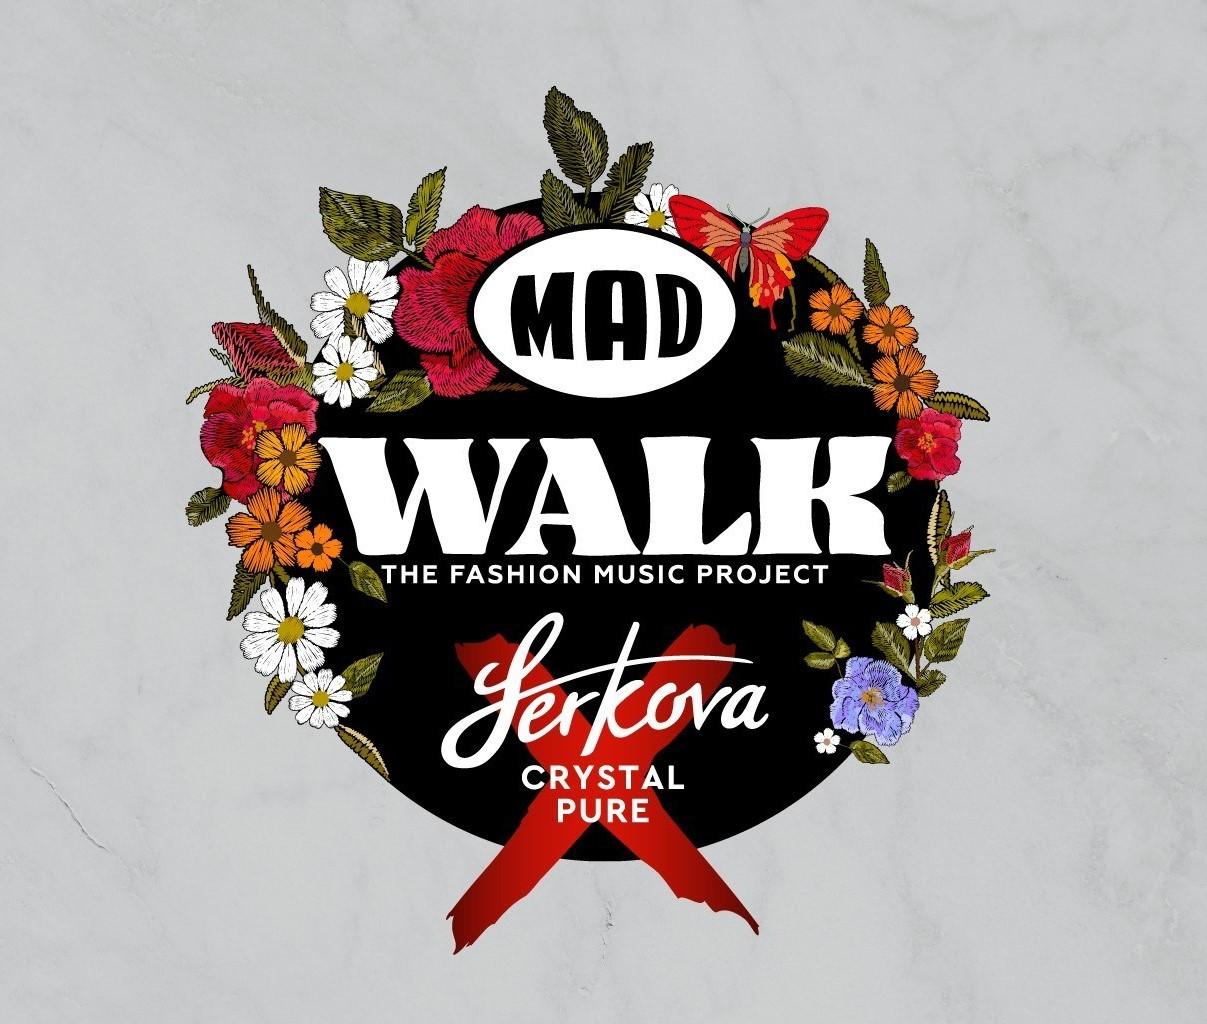 Madwalk 2019 : les Eurostars à l'honneur